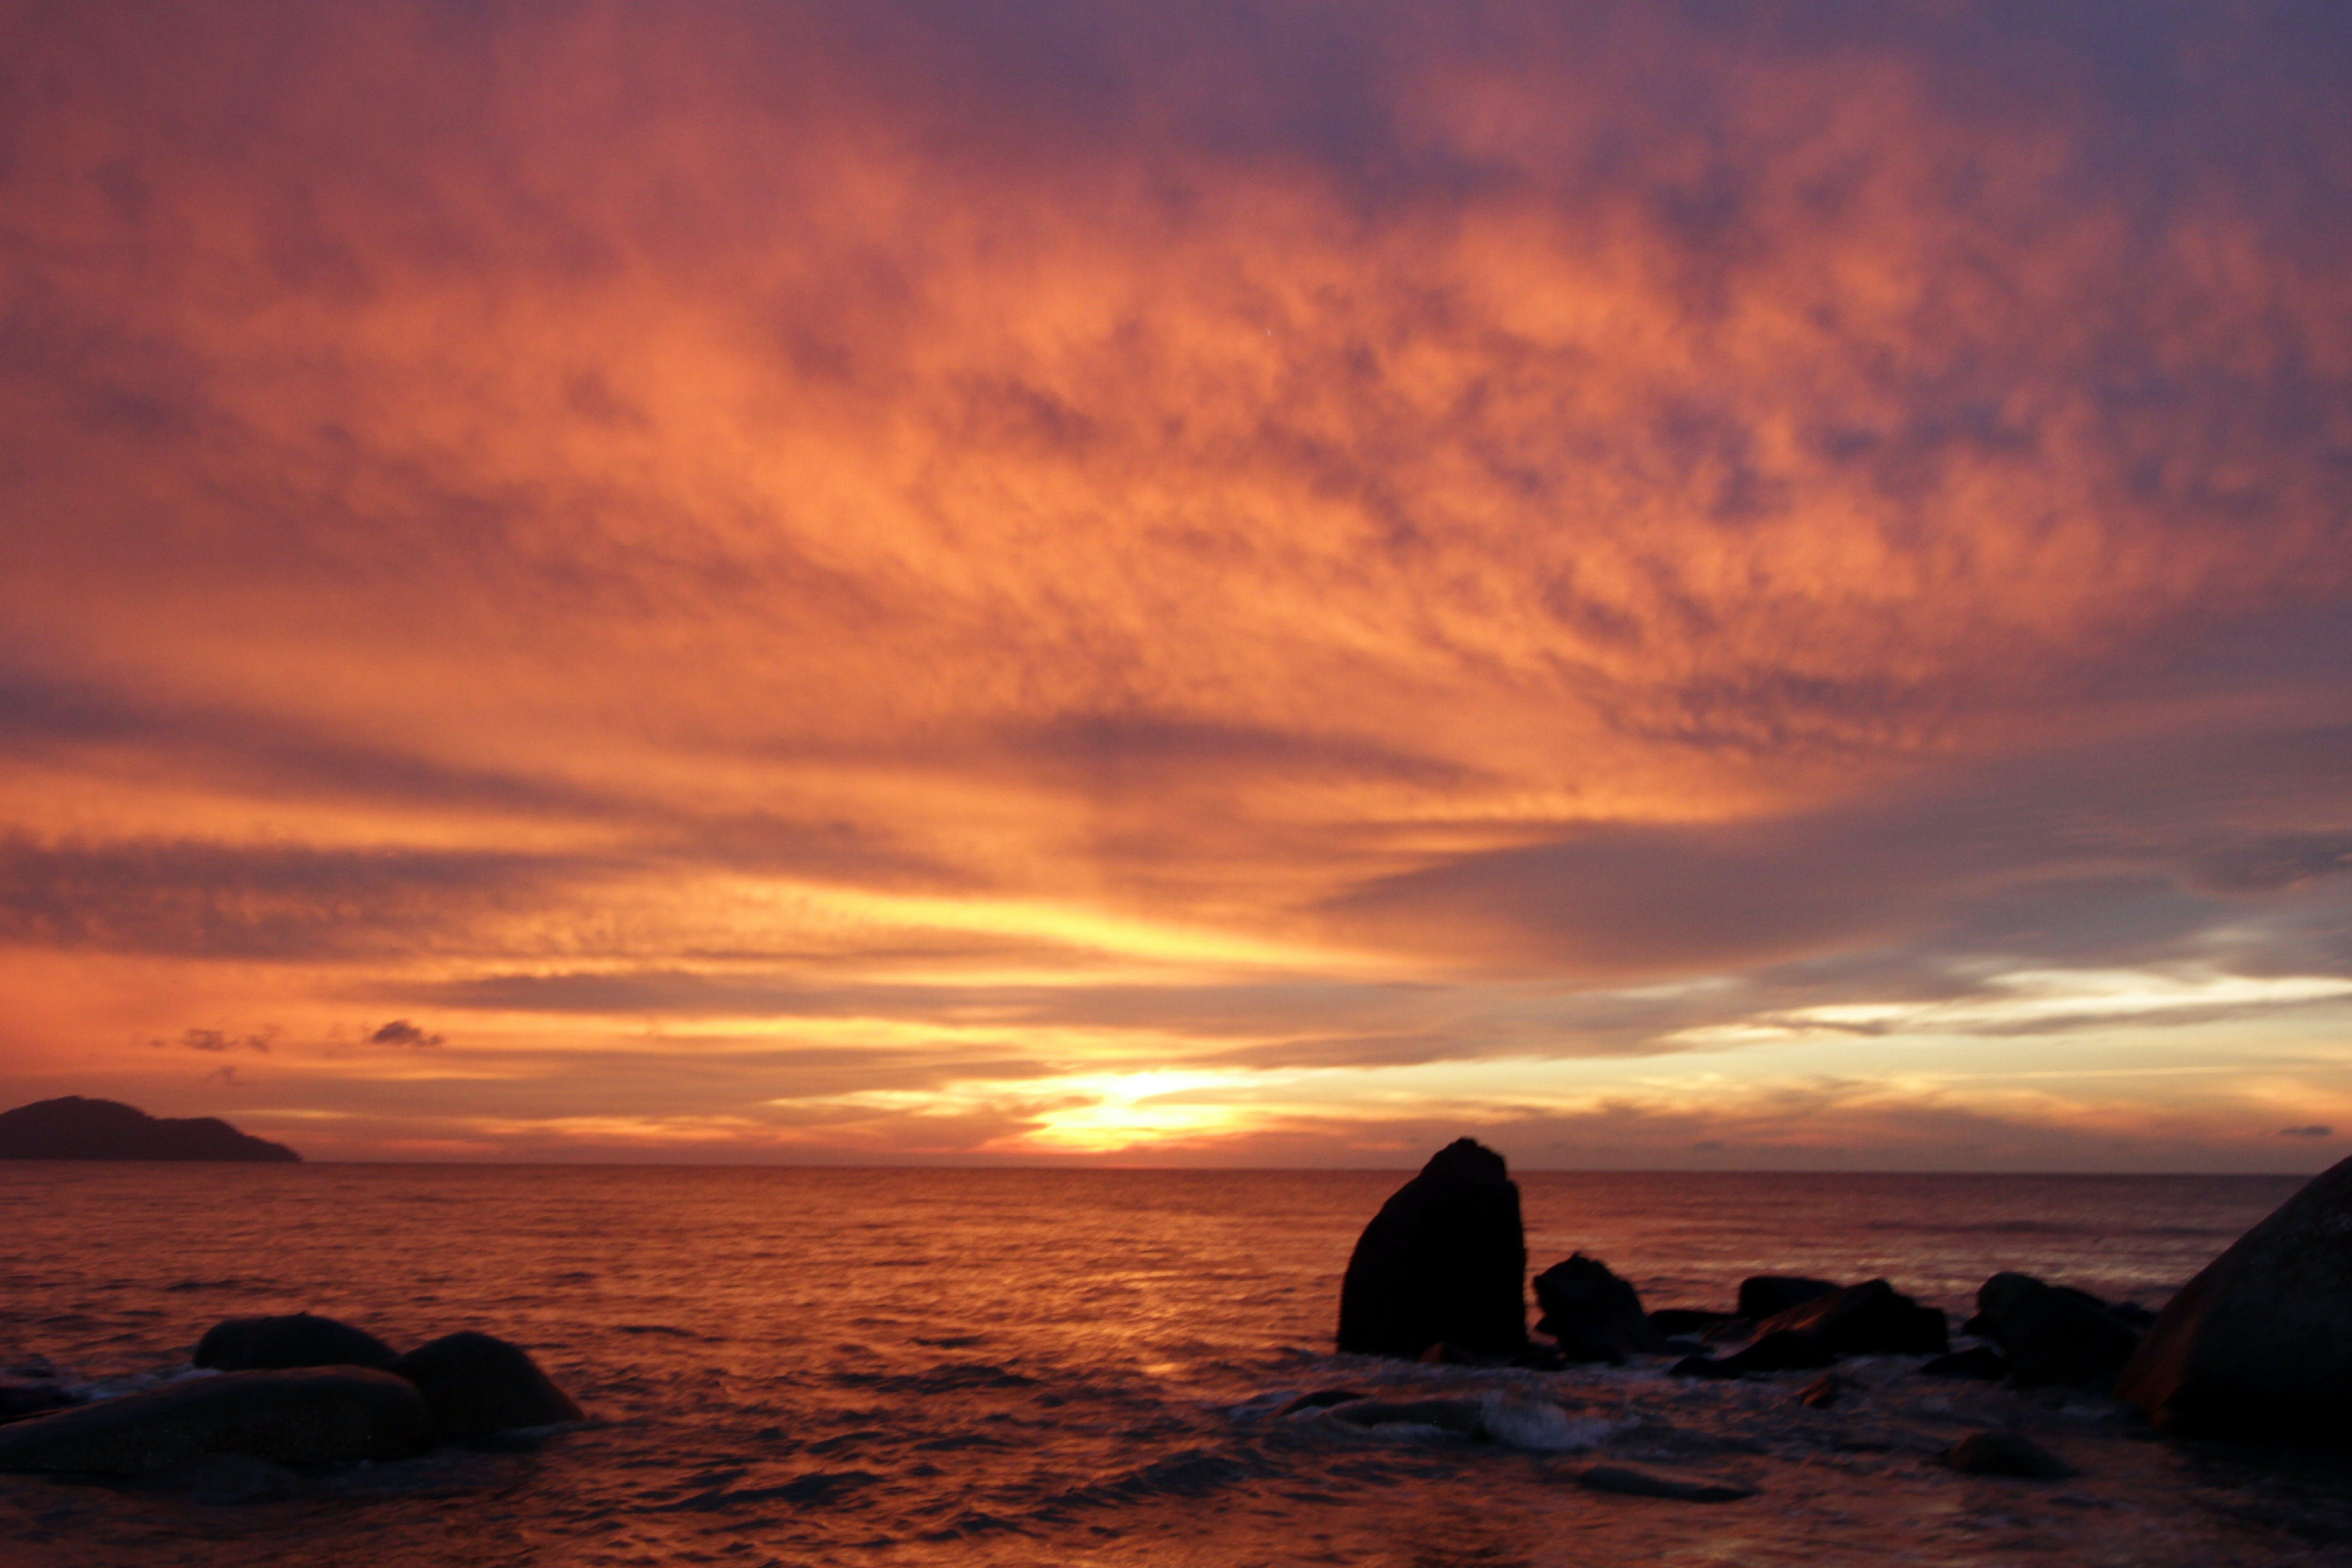 Free stock photo of #sunset, the sunset